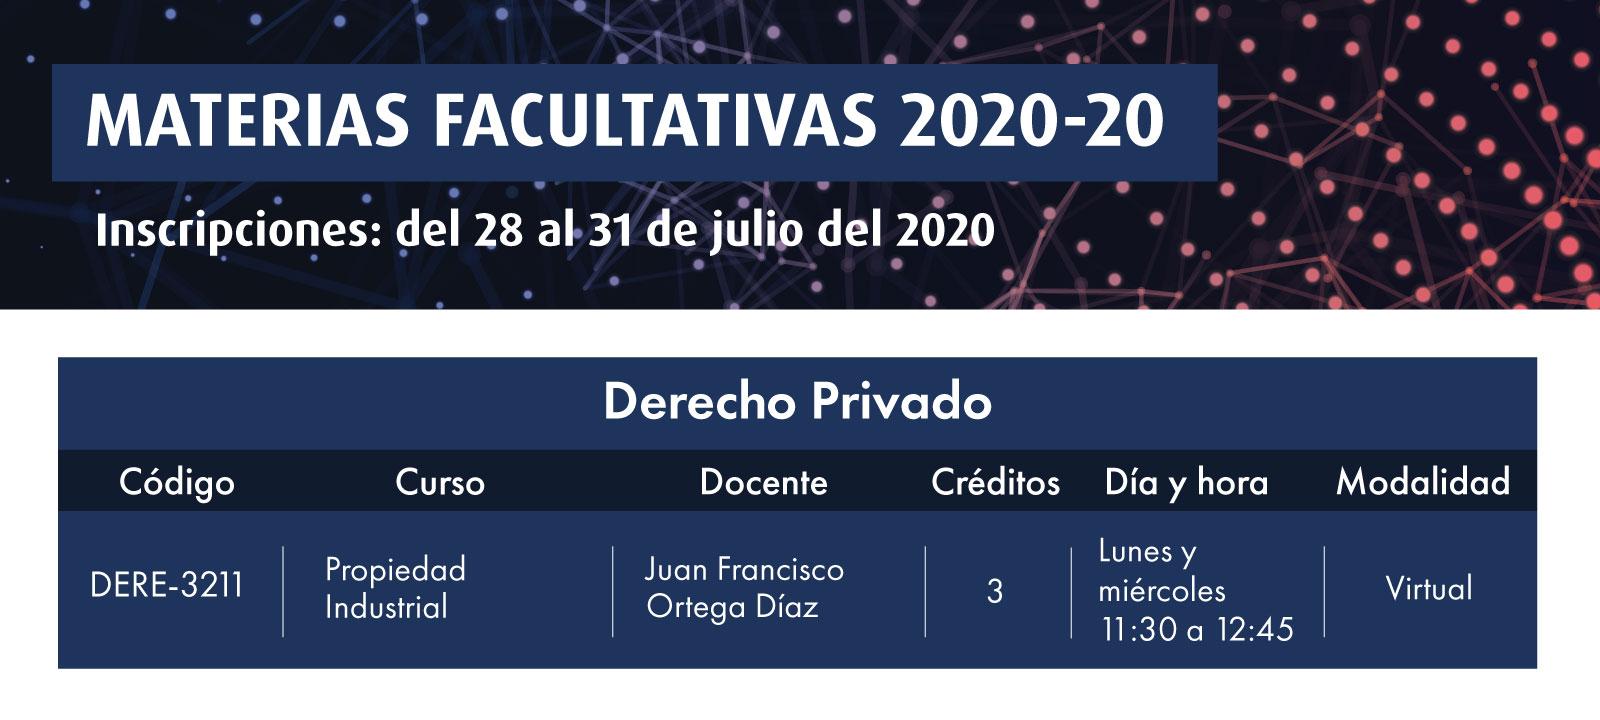 Facultativa 2020-20: Propiedad Industrial